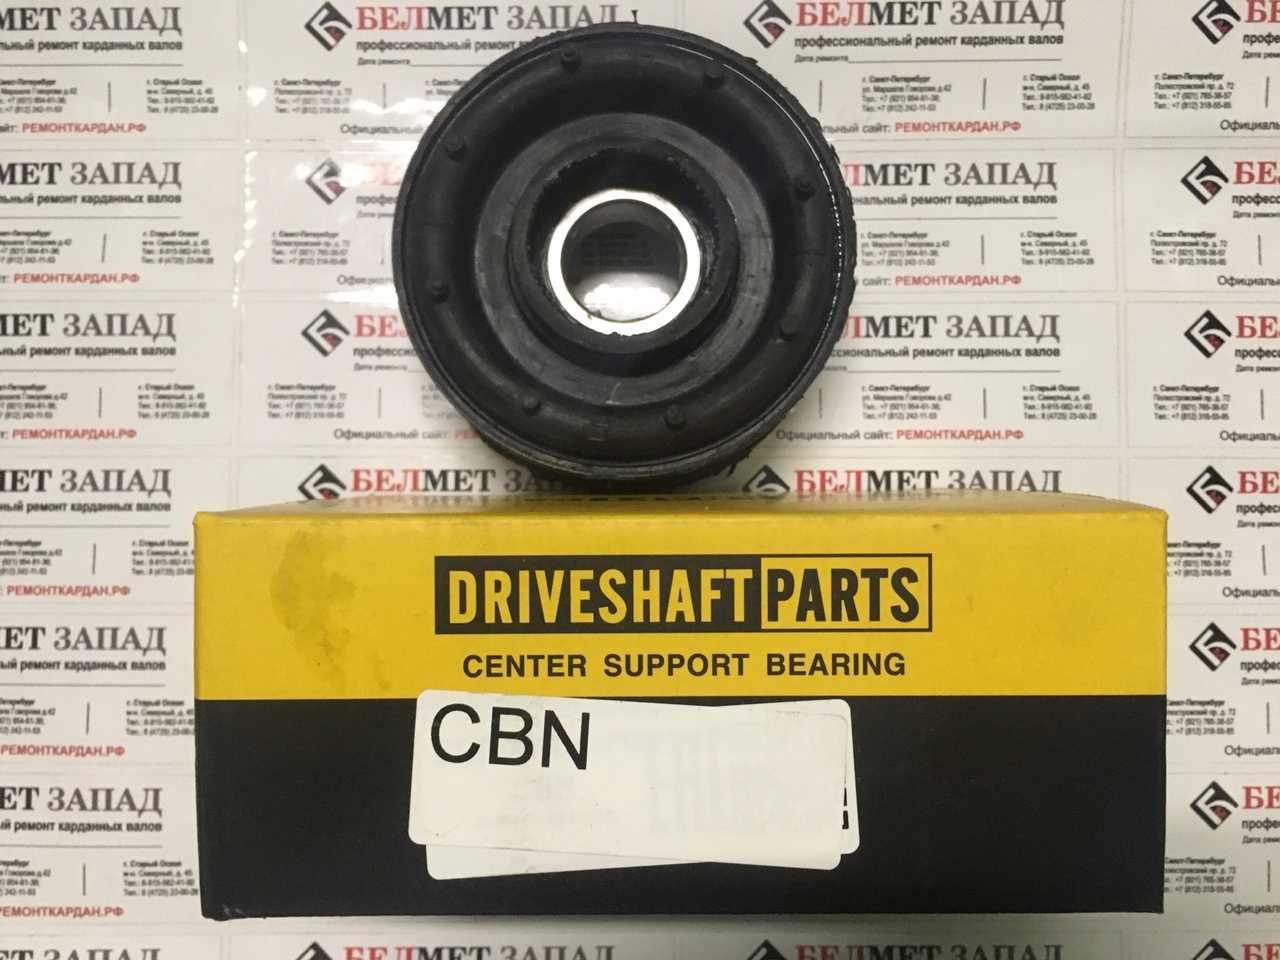 Подвесной подшипник карданного вала 30 (16) CBN для автомобилей Nissan Navara/X-Trail/Qashqai/200SX/Rogue/Pick Up